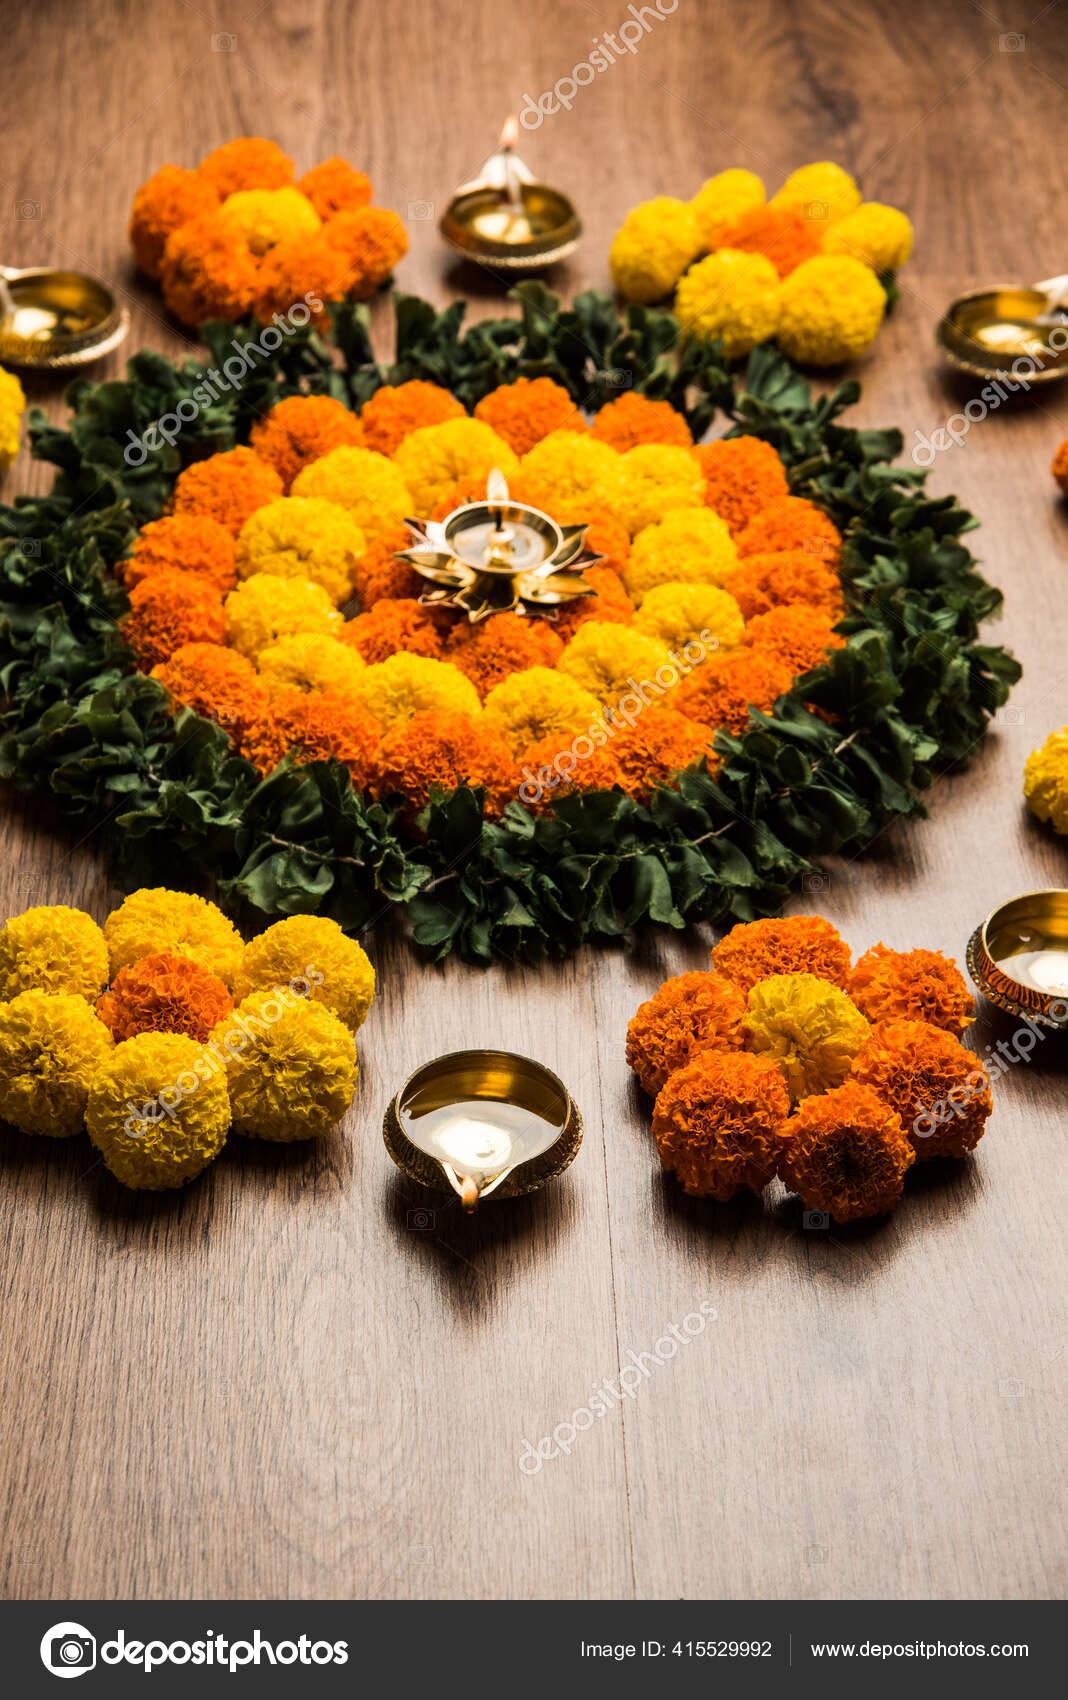 Flower Rangoli Diwali Pongal Festival Made Using Marigold Zendu Flowers Stock Photo C Stockimagefactory Com 415529992